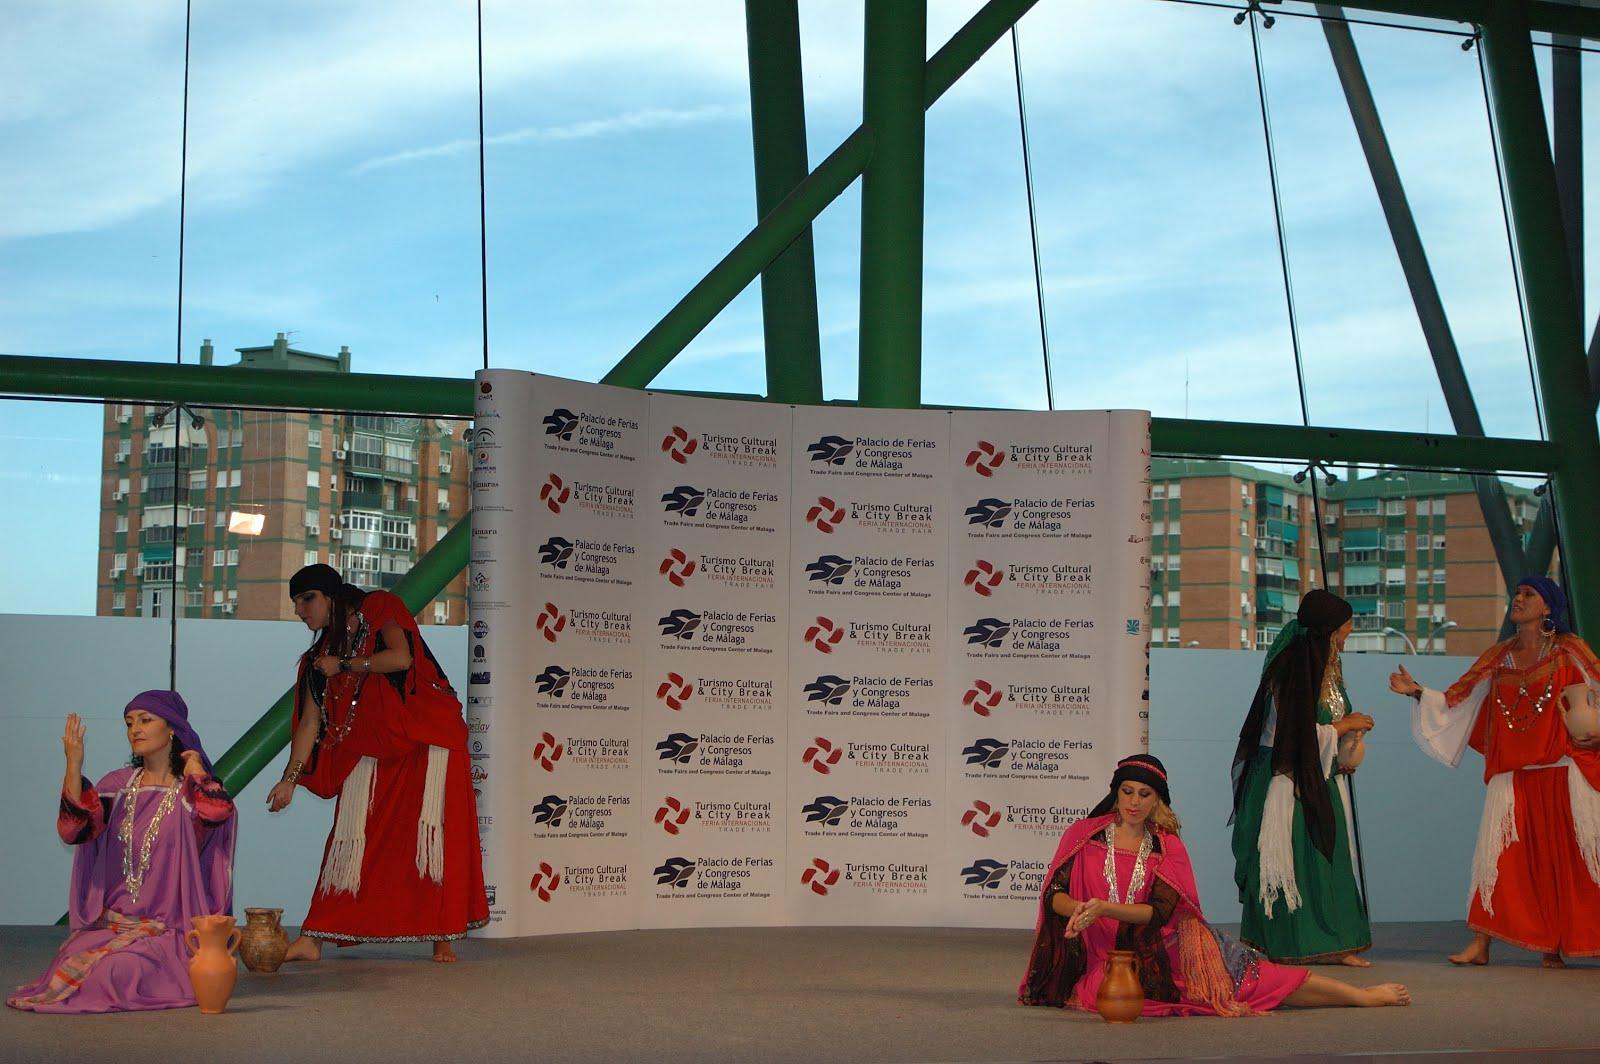 PALACIO DE CONGRESOS 2009